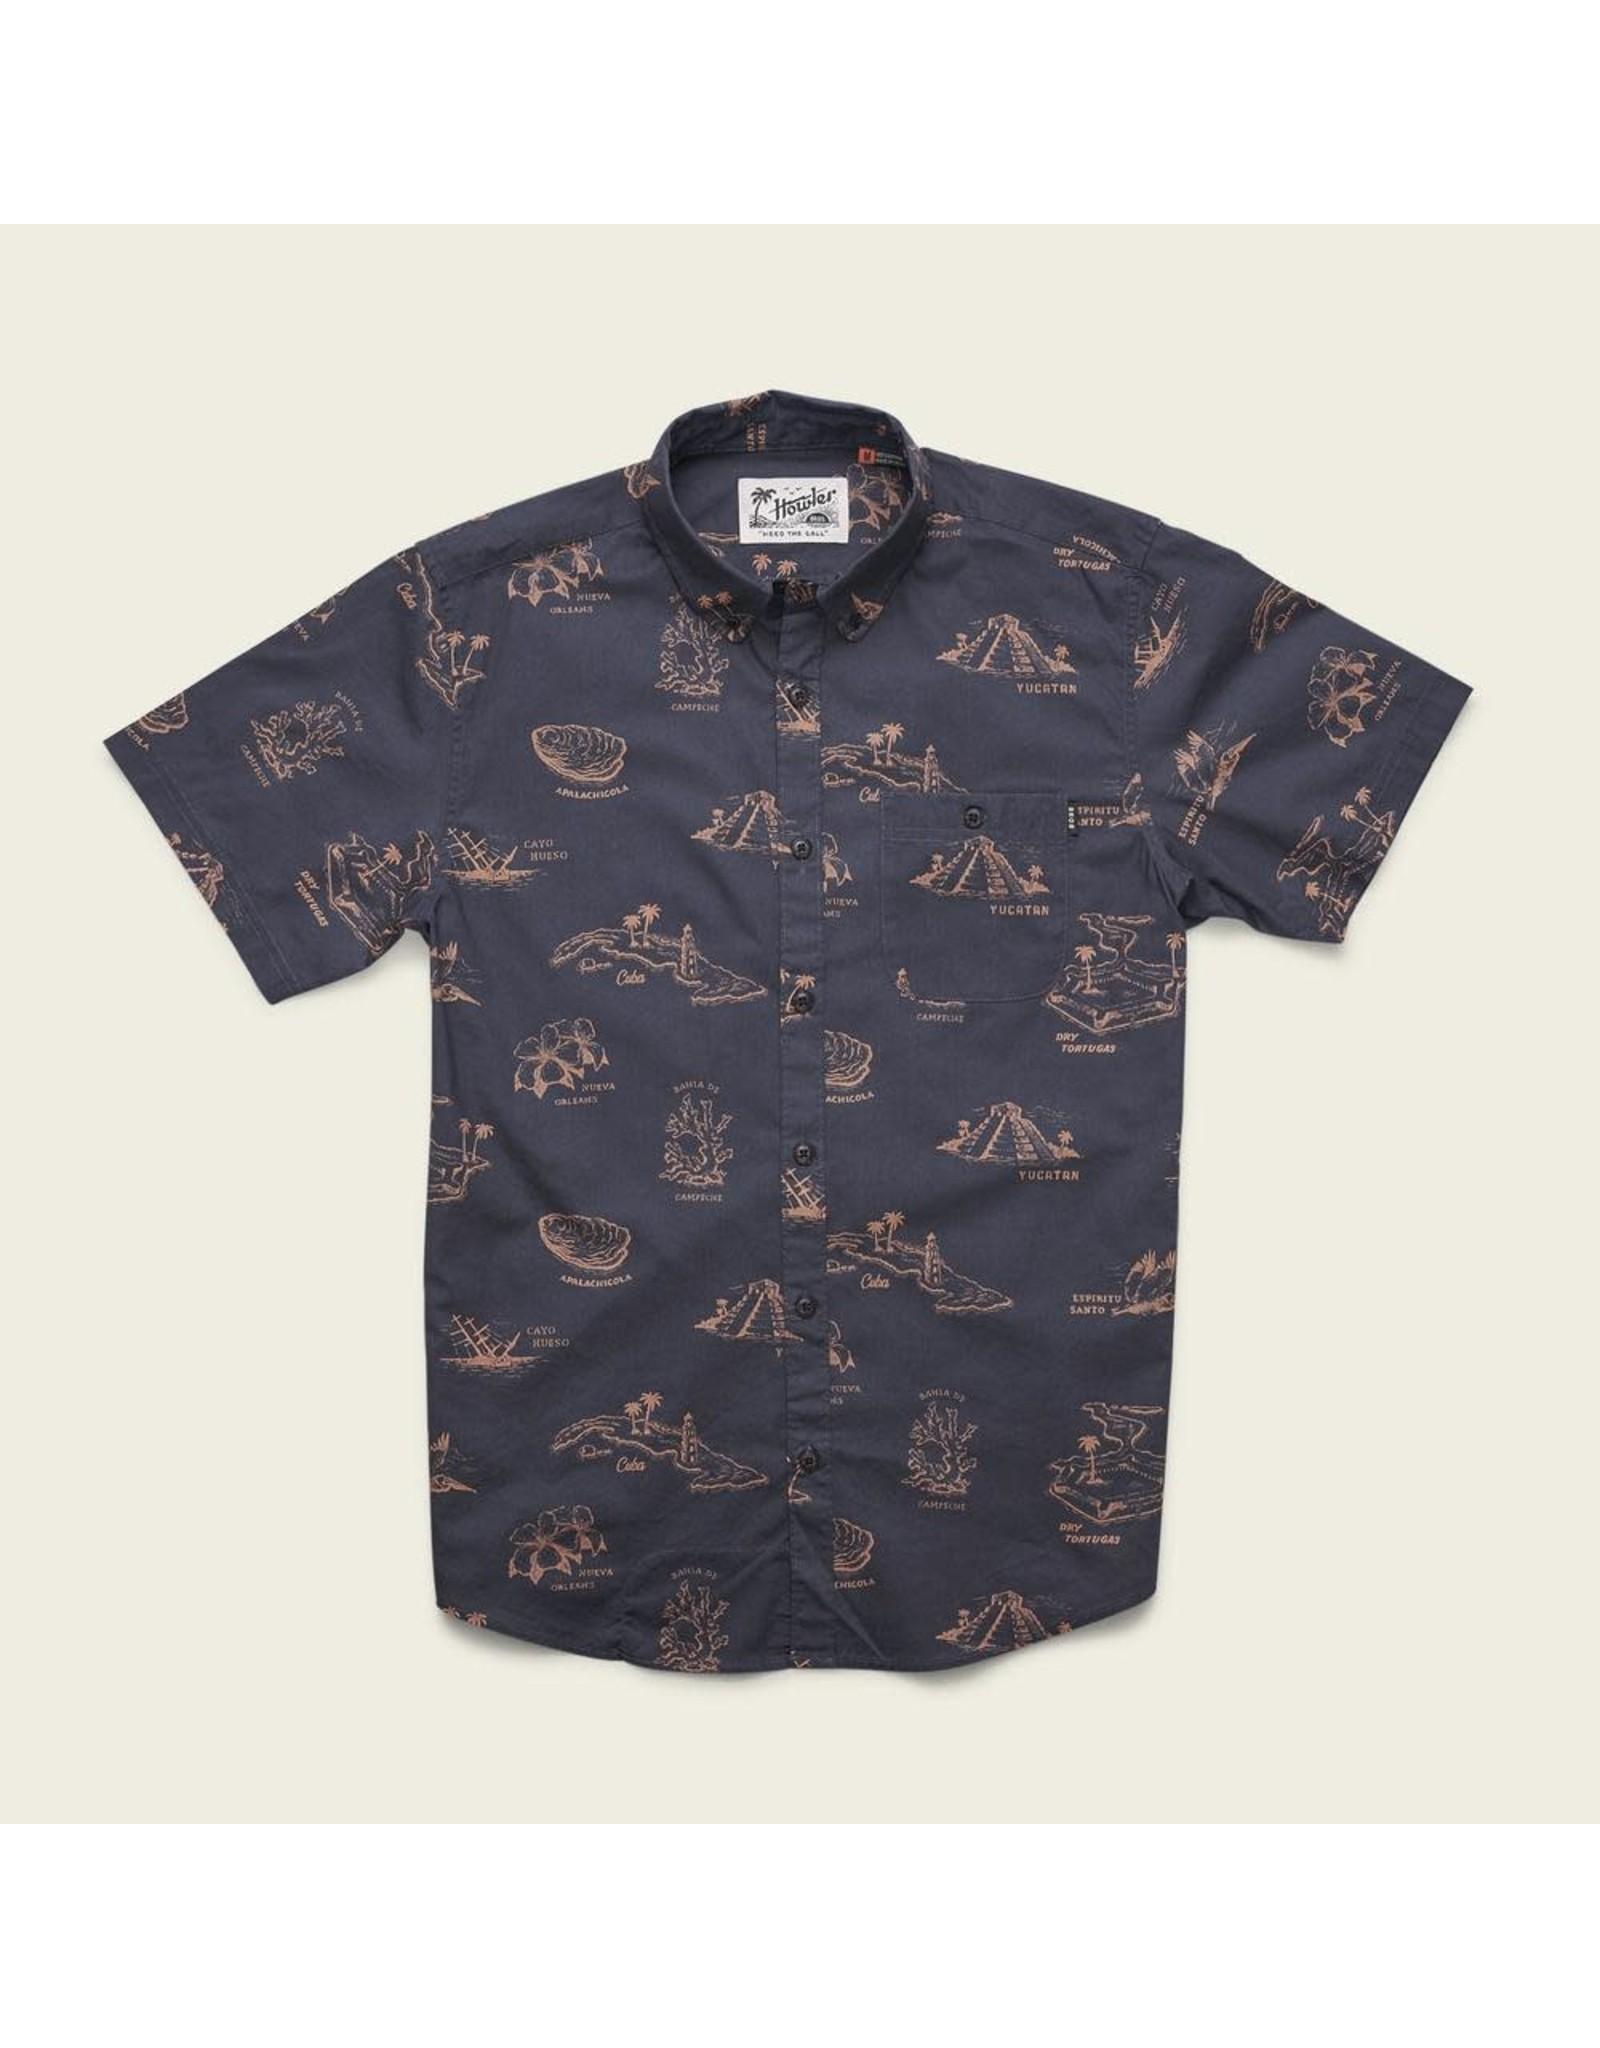 Howler Bros HB Mansfield Shirt - Gulf Destinations